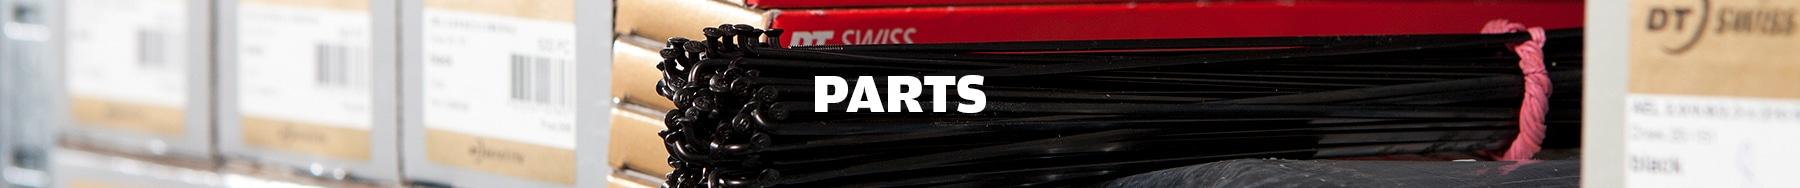 FFWD Wheels Carbon Cycling Wheels Parts